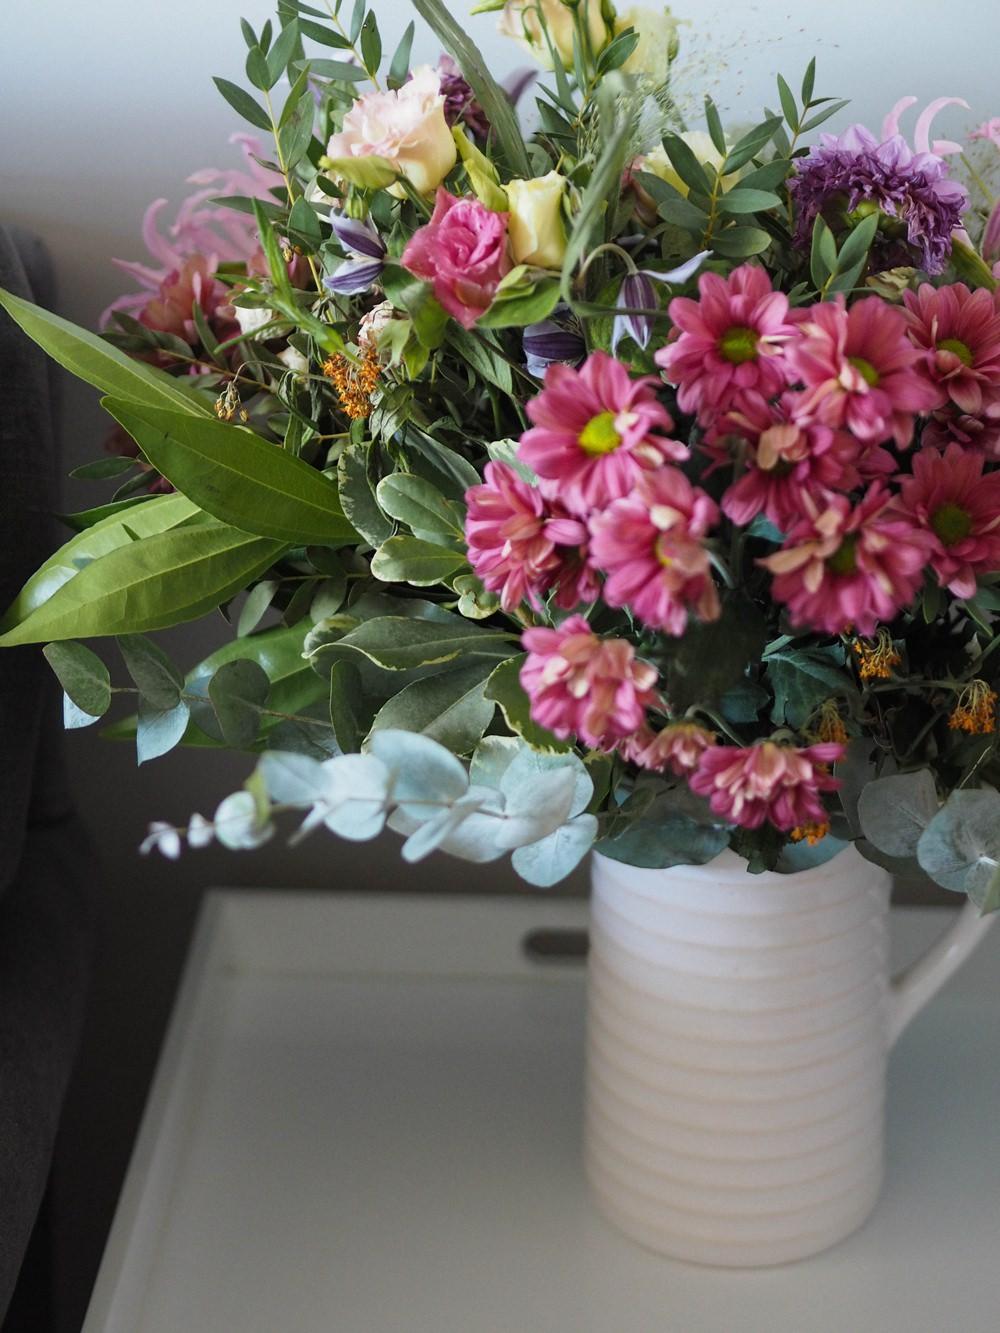 1930s House Living Room Renovation Flowers Jug Vase Side Table